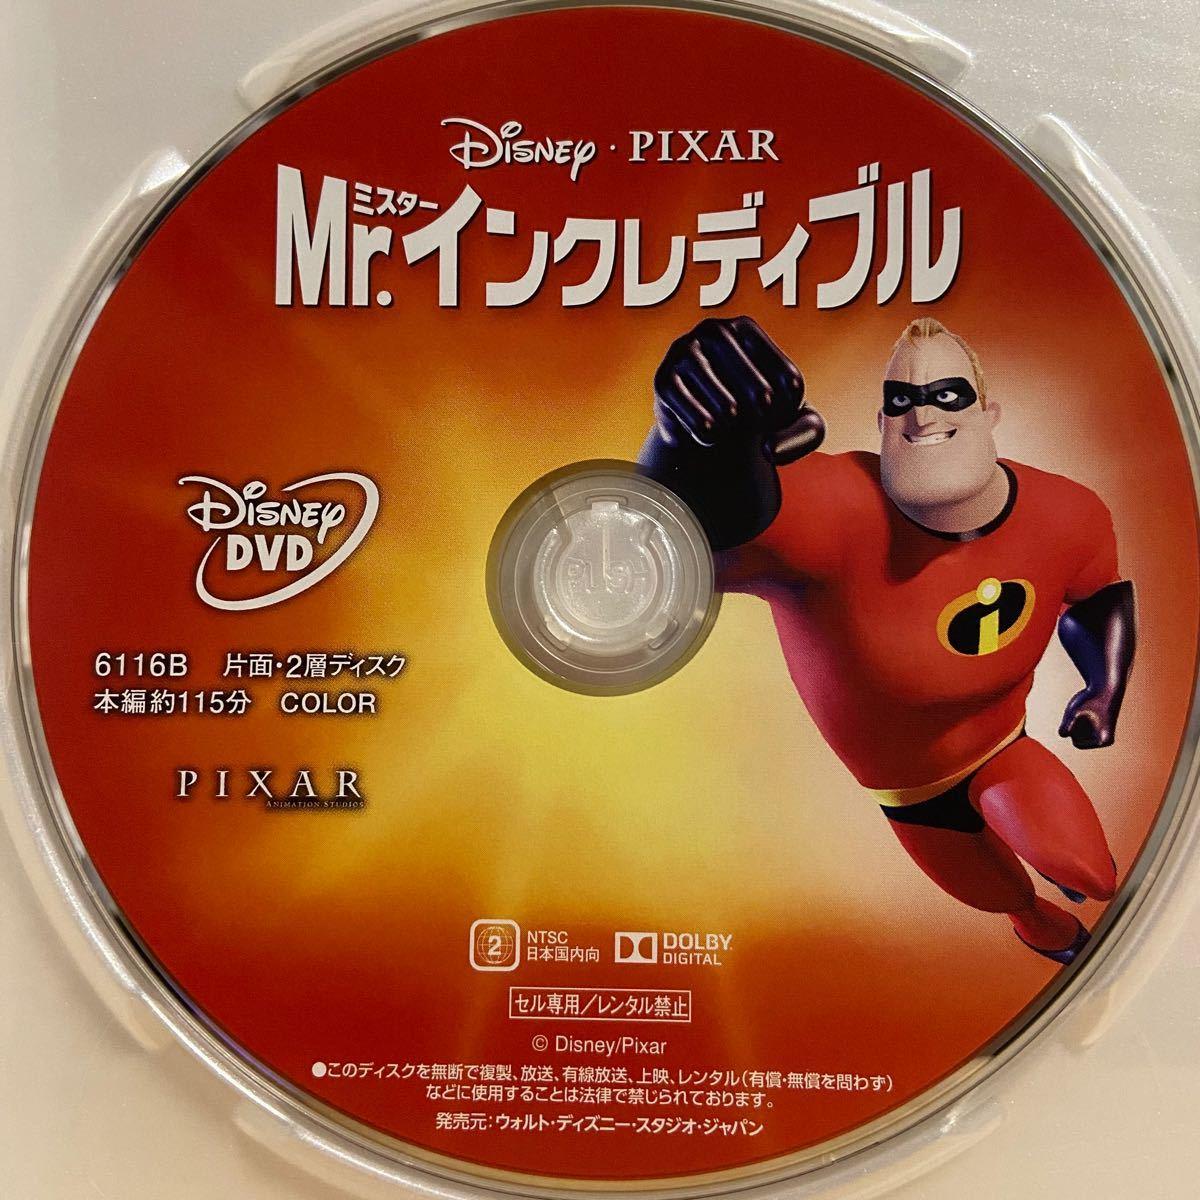 Mr.インクレディブル MovieNEX DVD+純正ケース